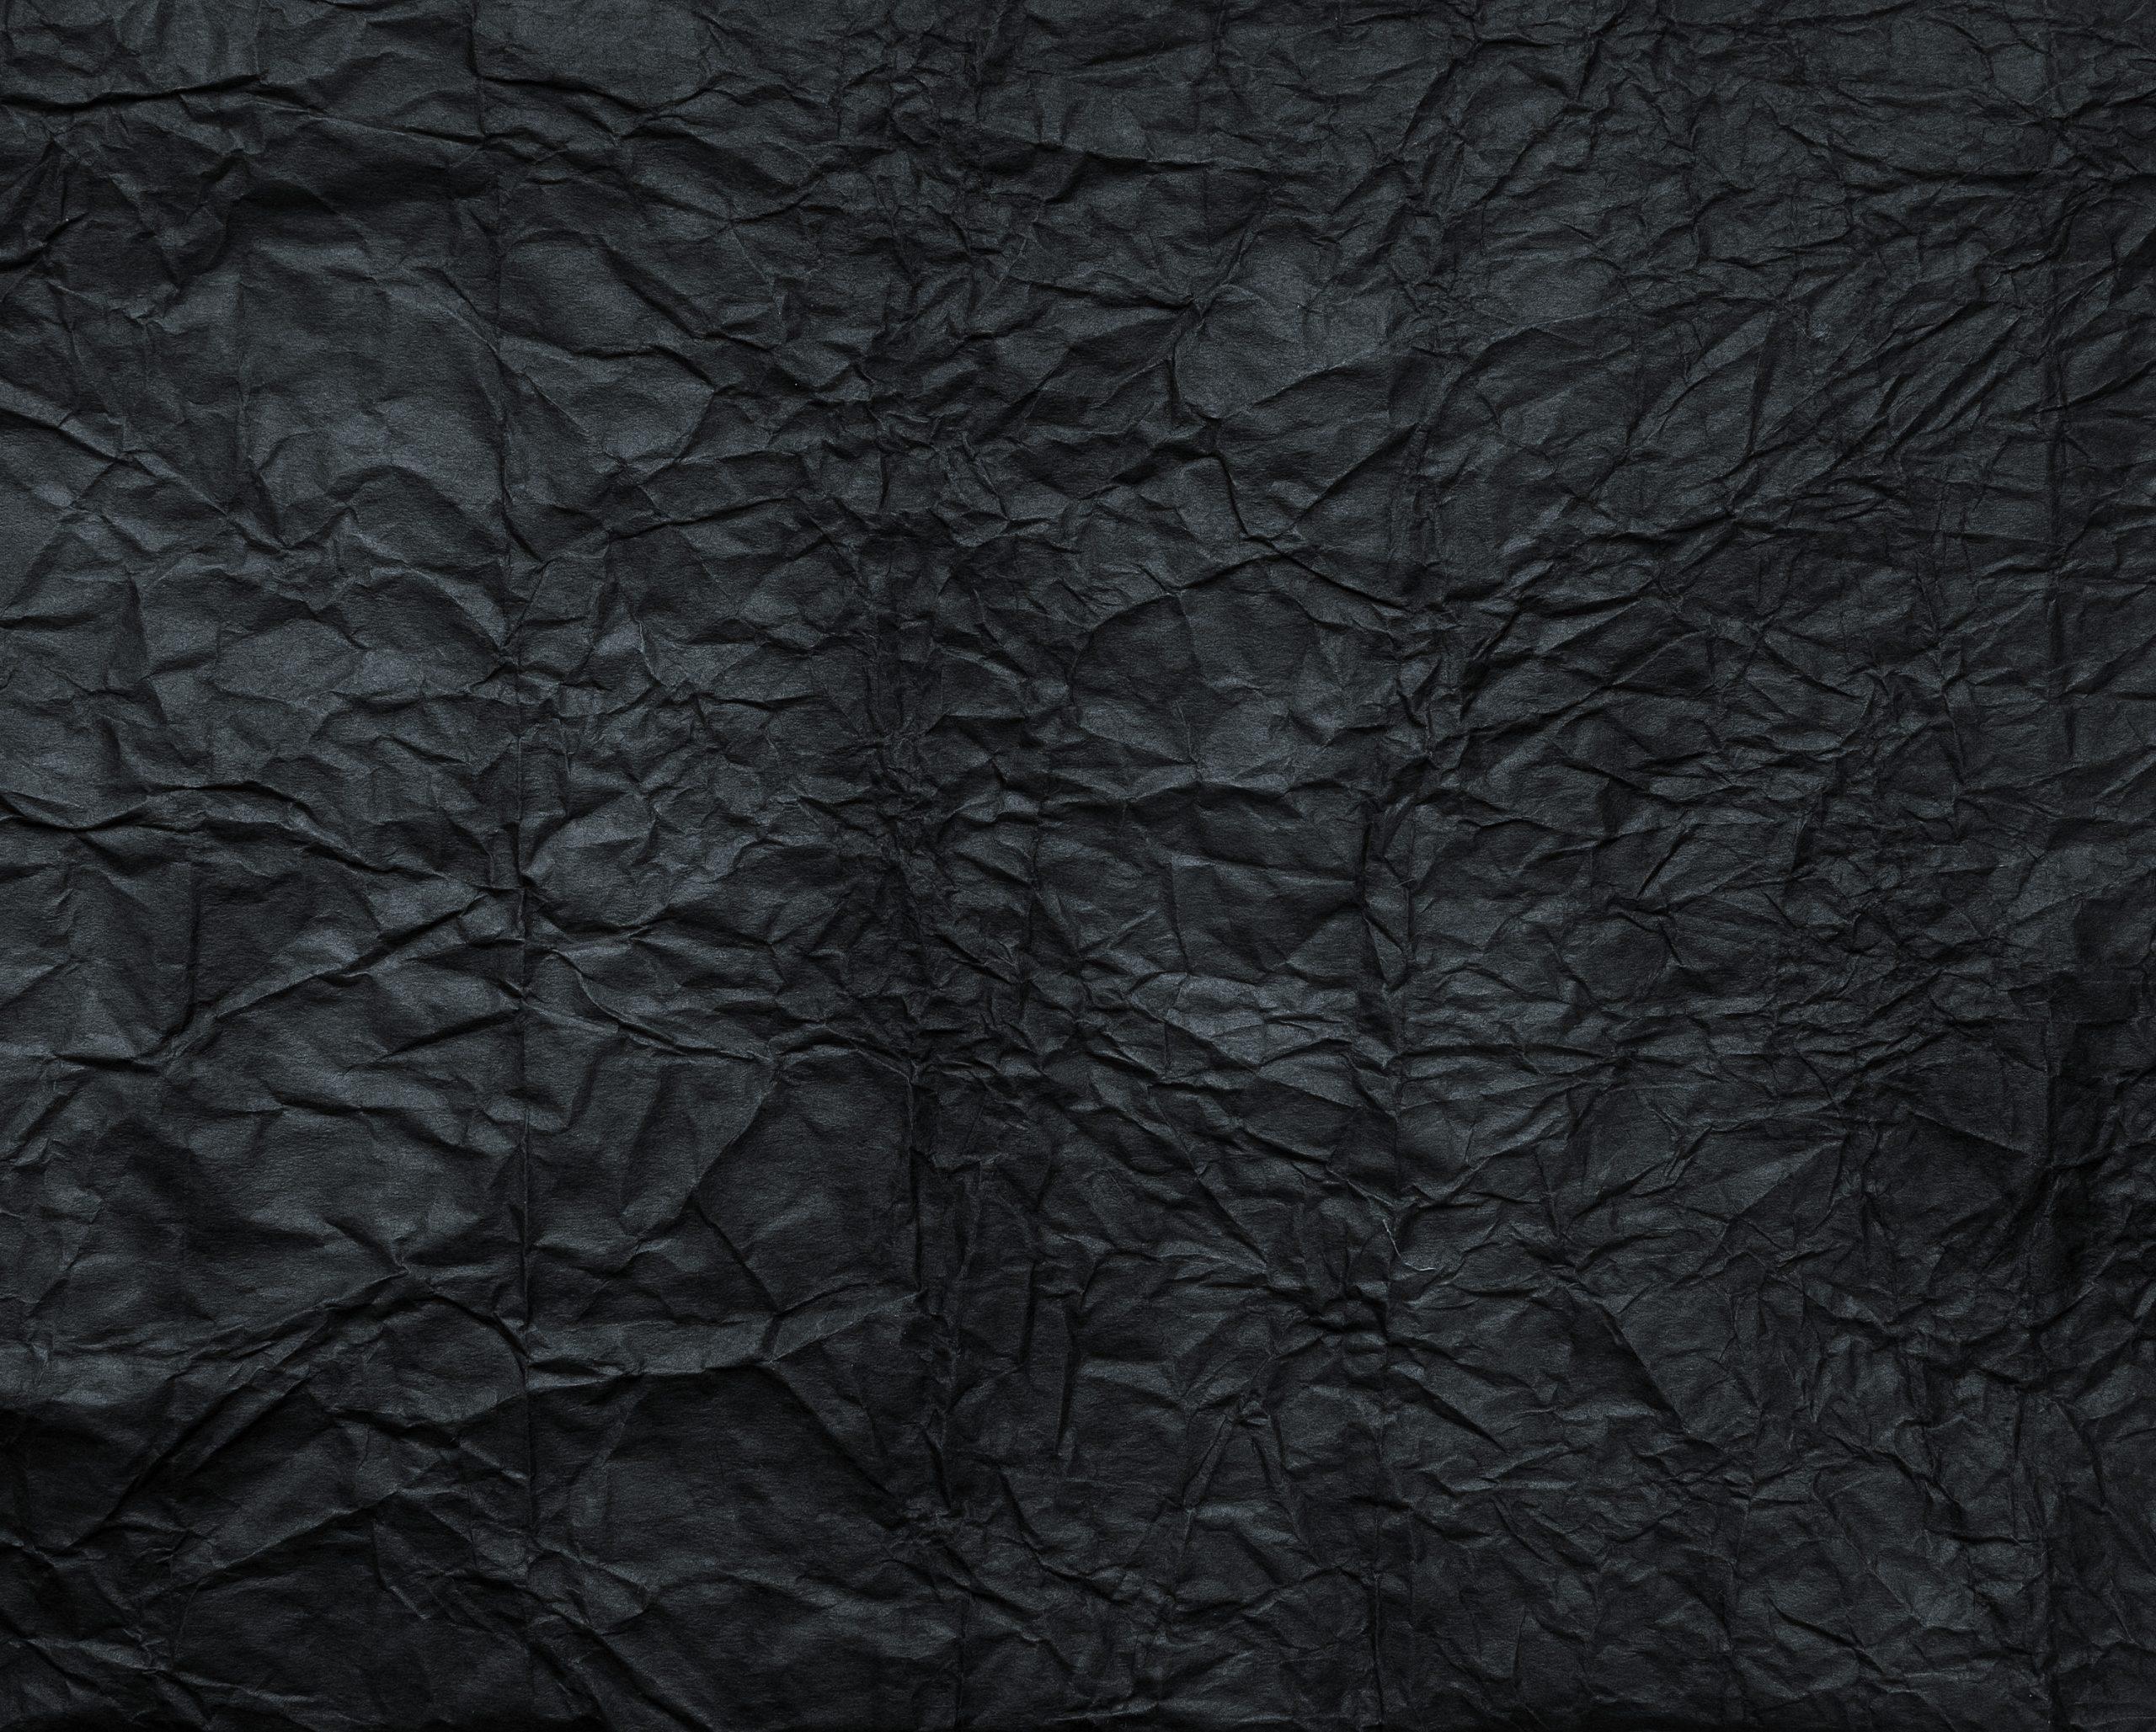 wildtextures-creased-black-paper-texture